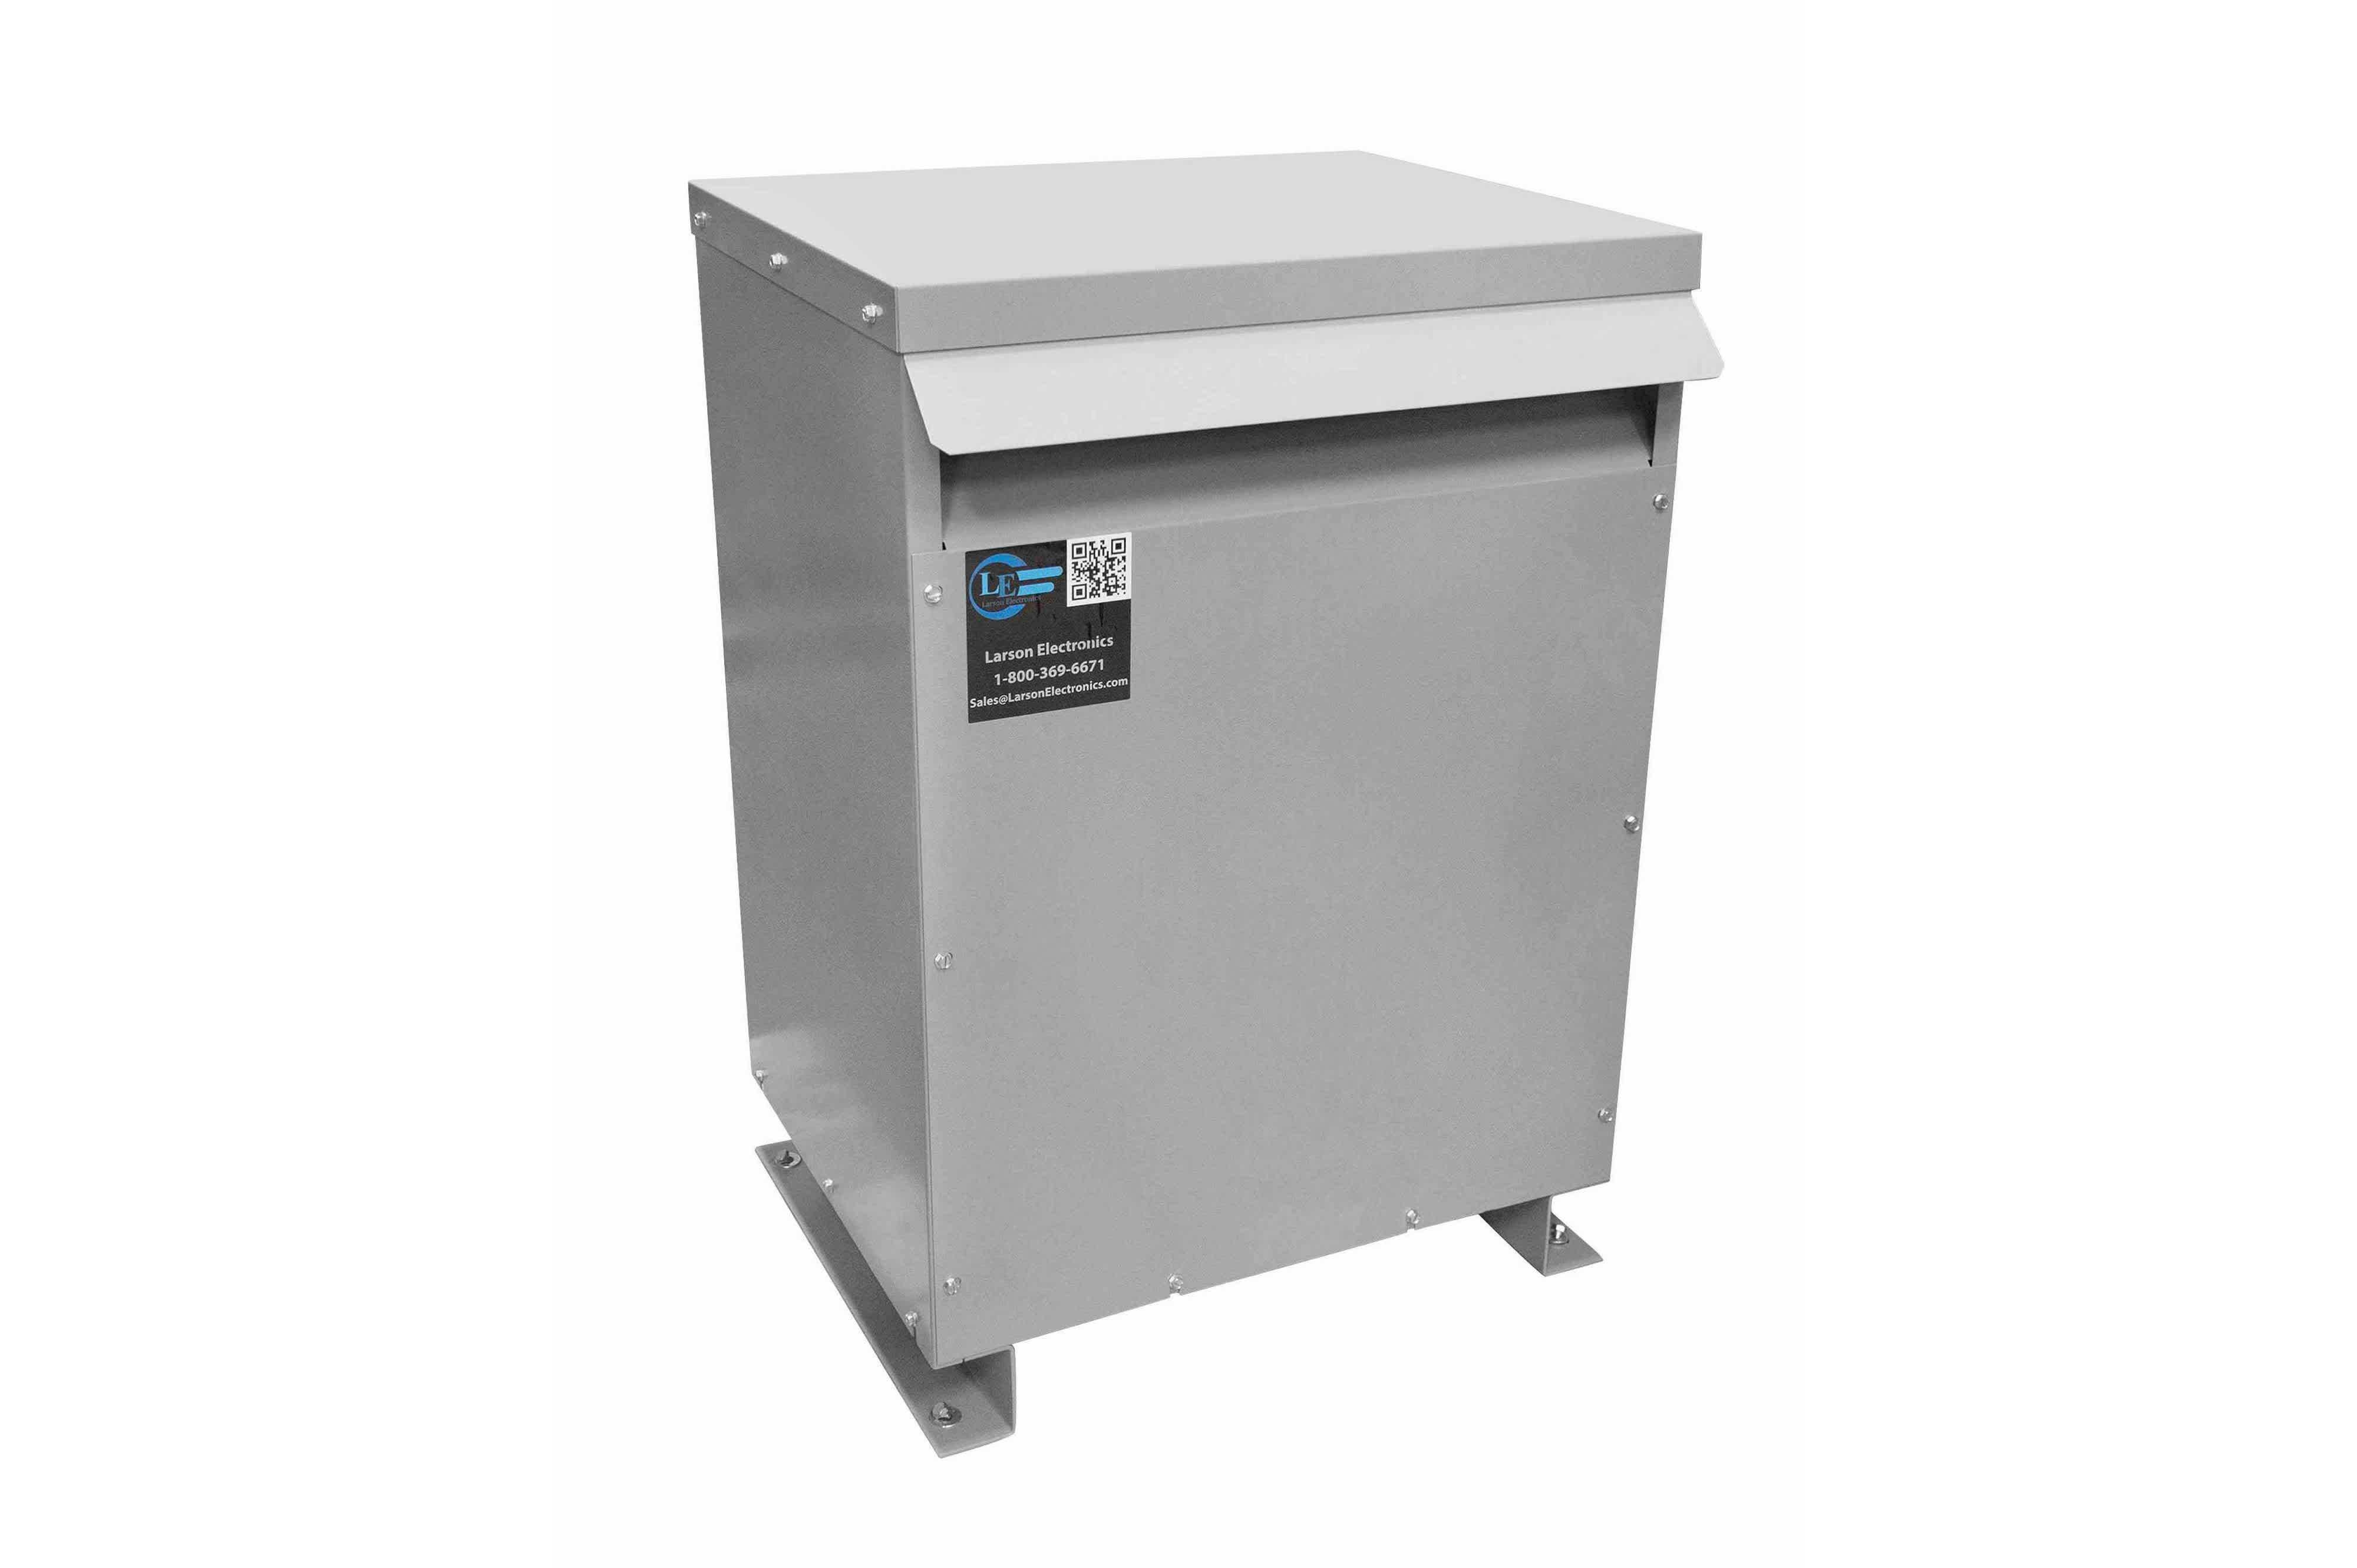 12 kVA 3PH Isolation Transformer, 415V Wye Primary, 600Y/347 Wye-N Secondary, N3R, Ventilated, 60 Hz